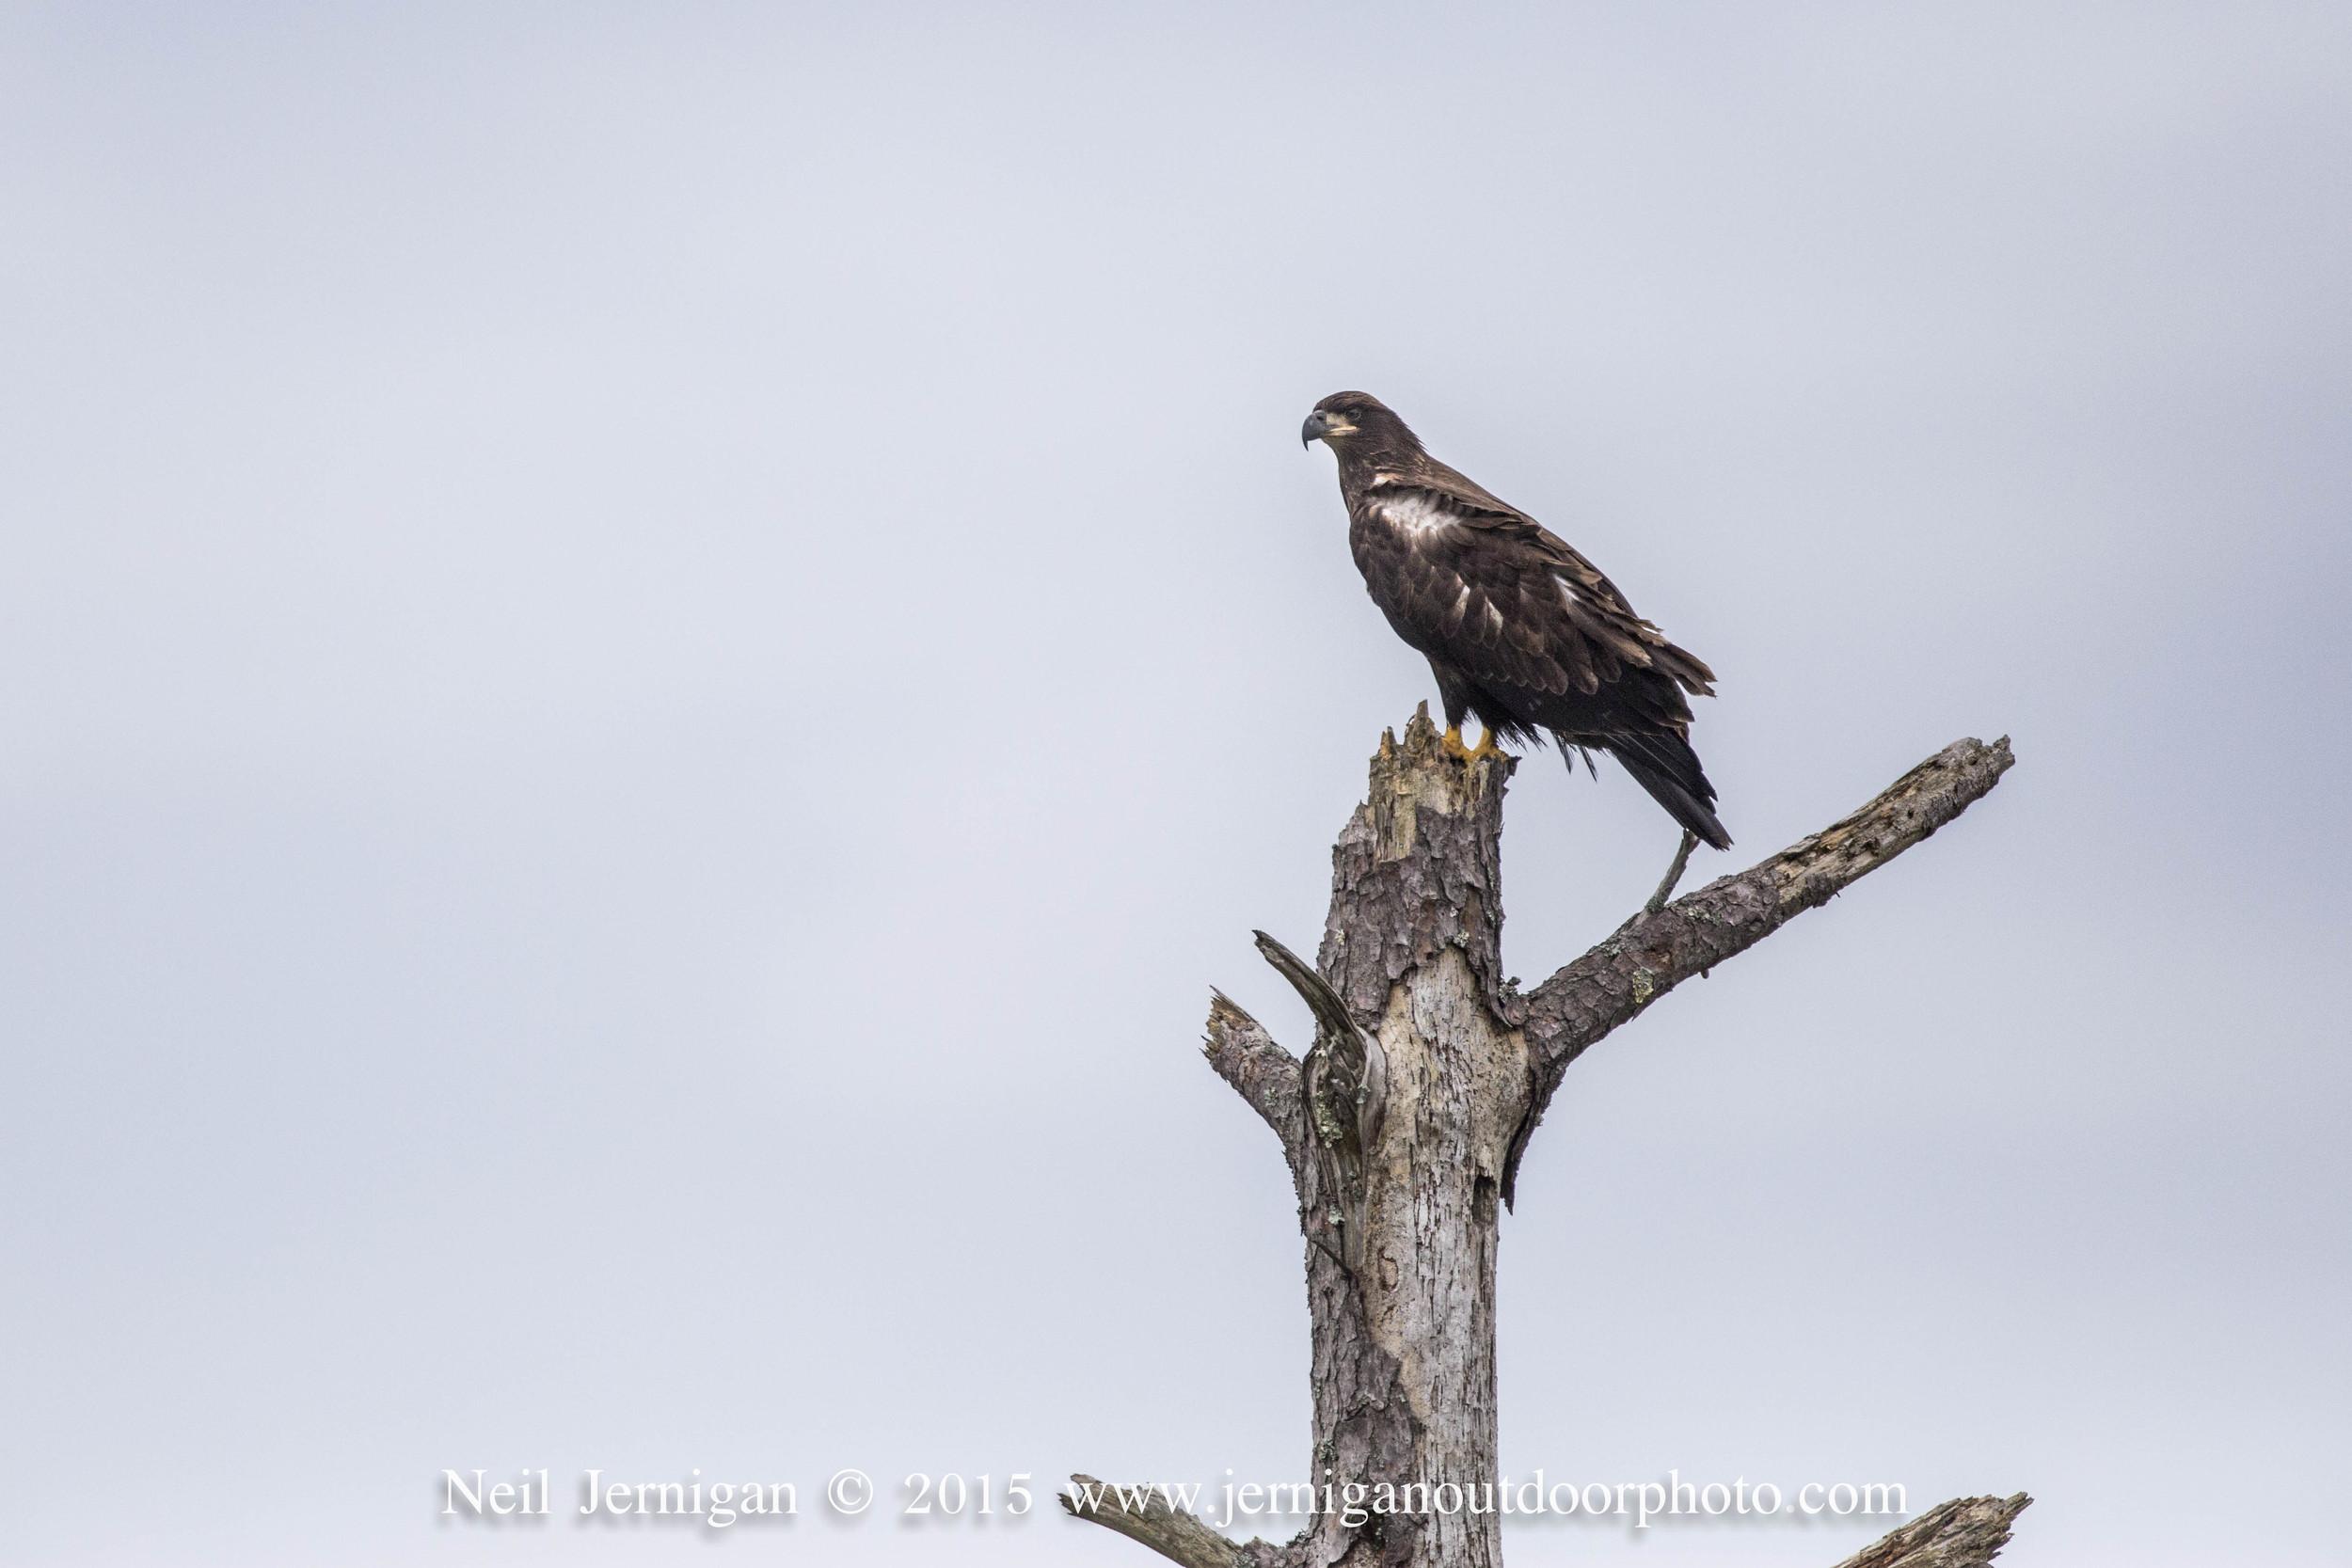 Immature Bald Eagle resting atop a dead pine tree.